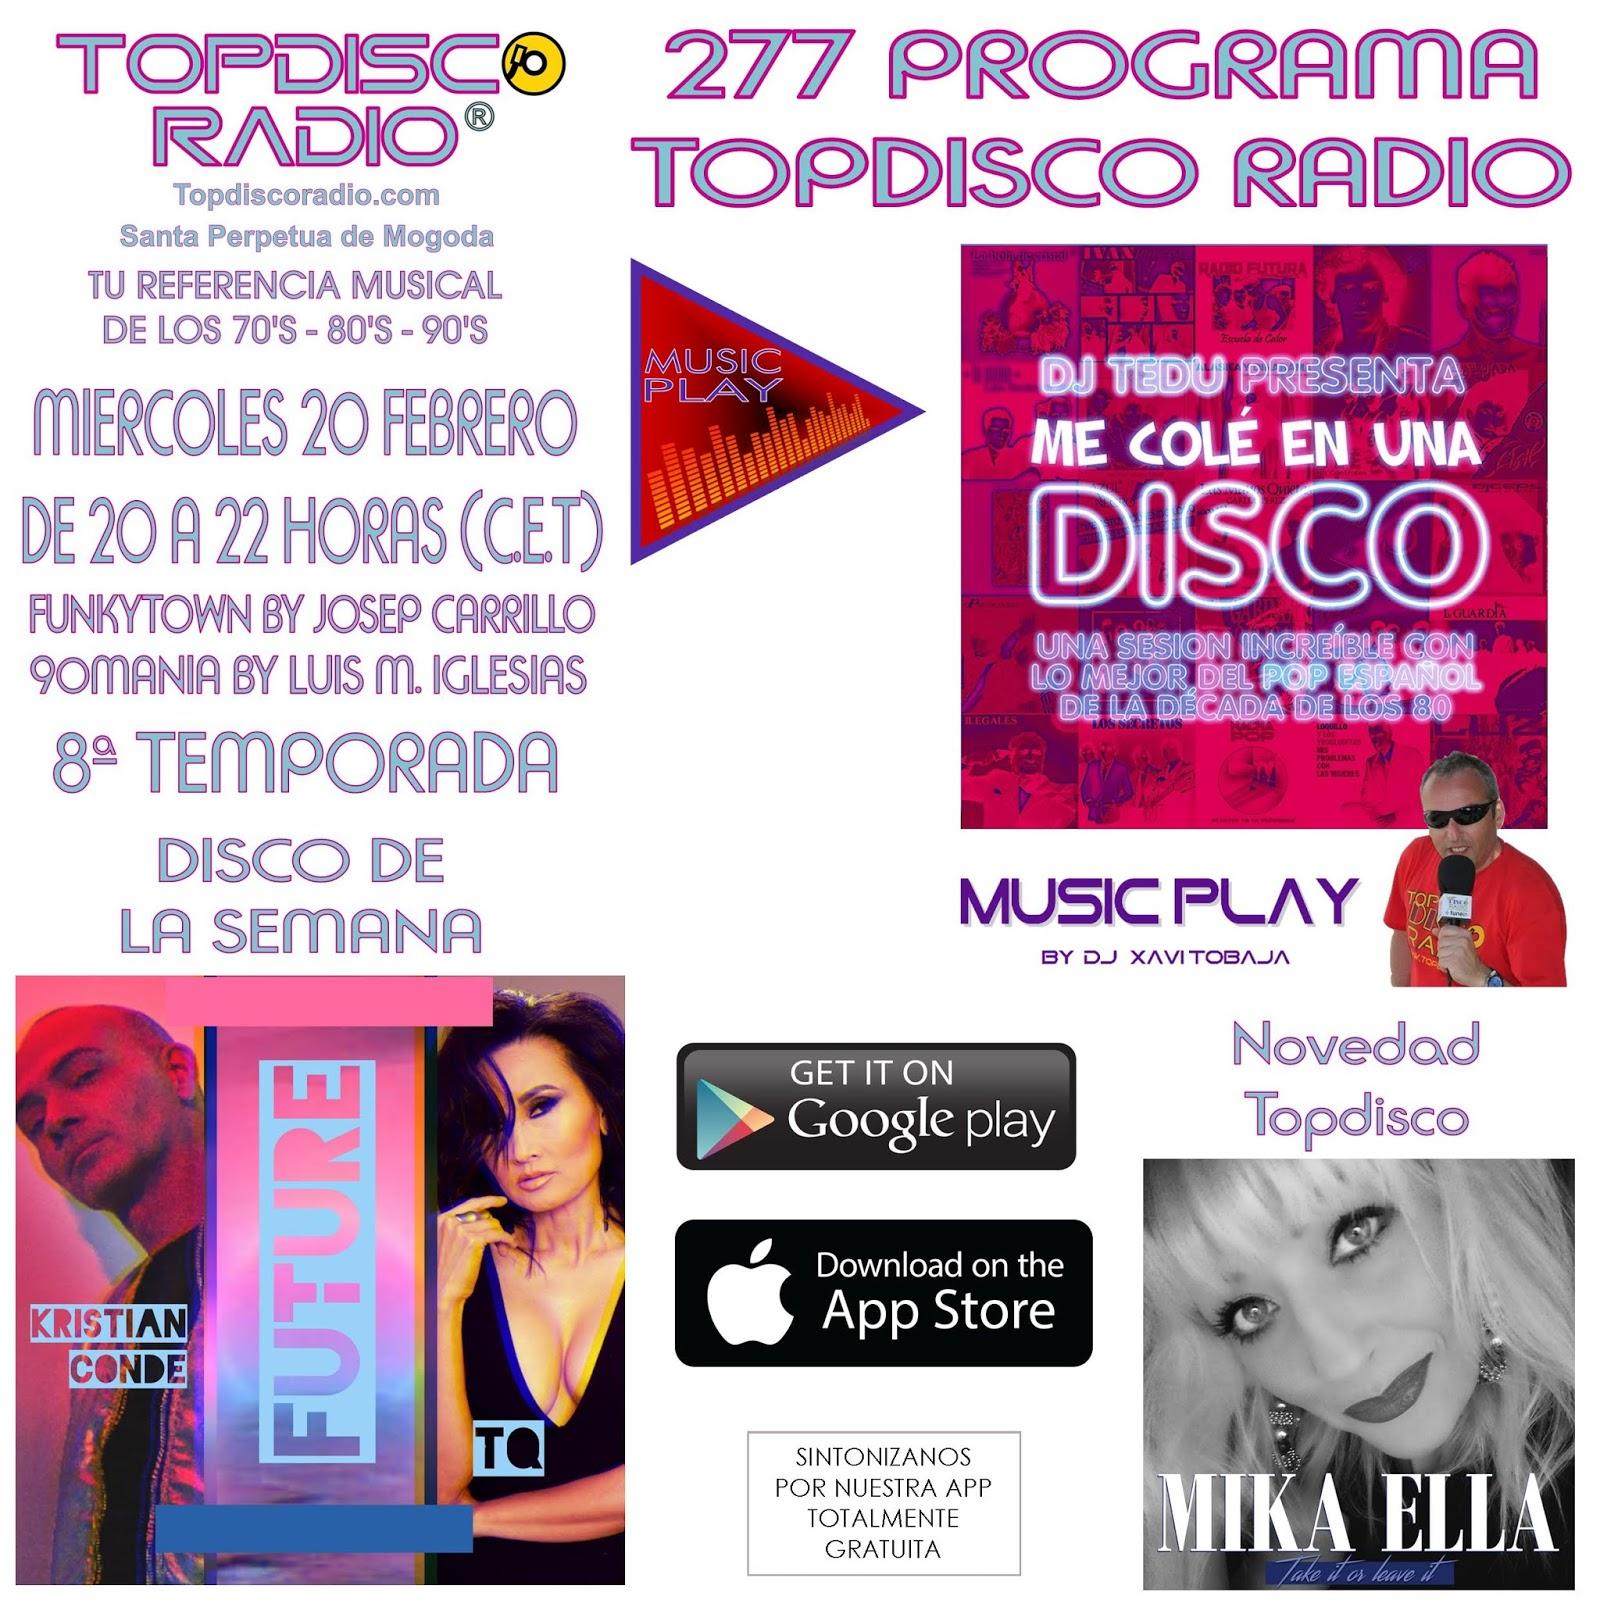 277 Programa Topdisco Radio